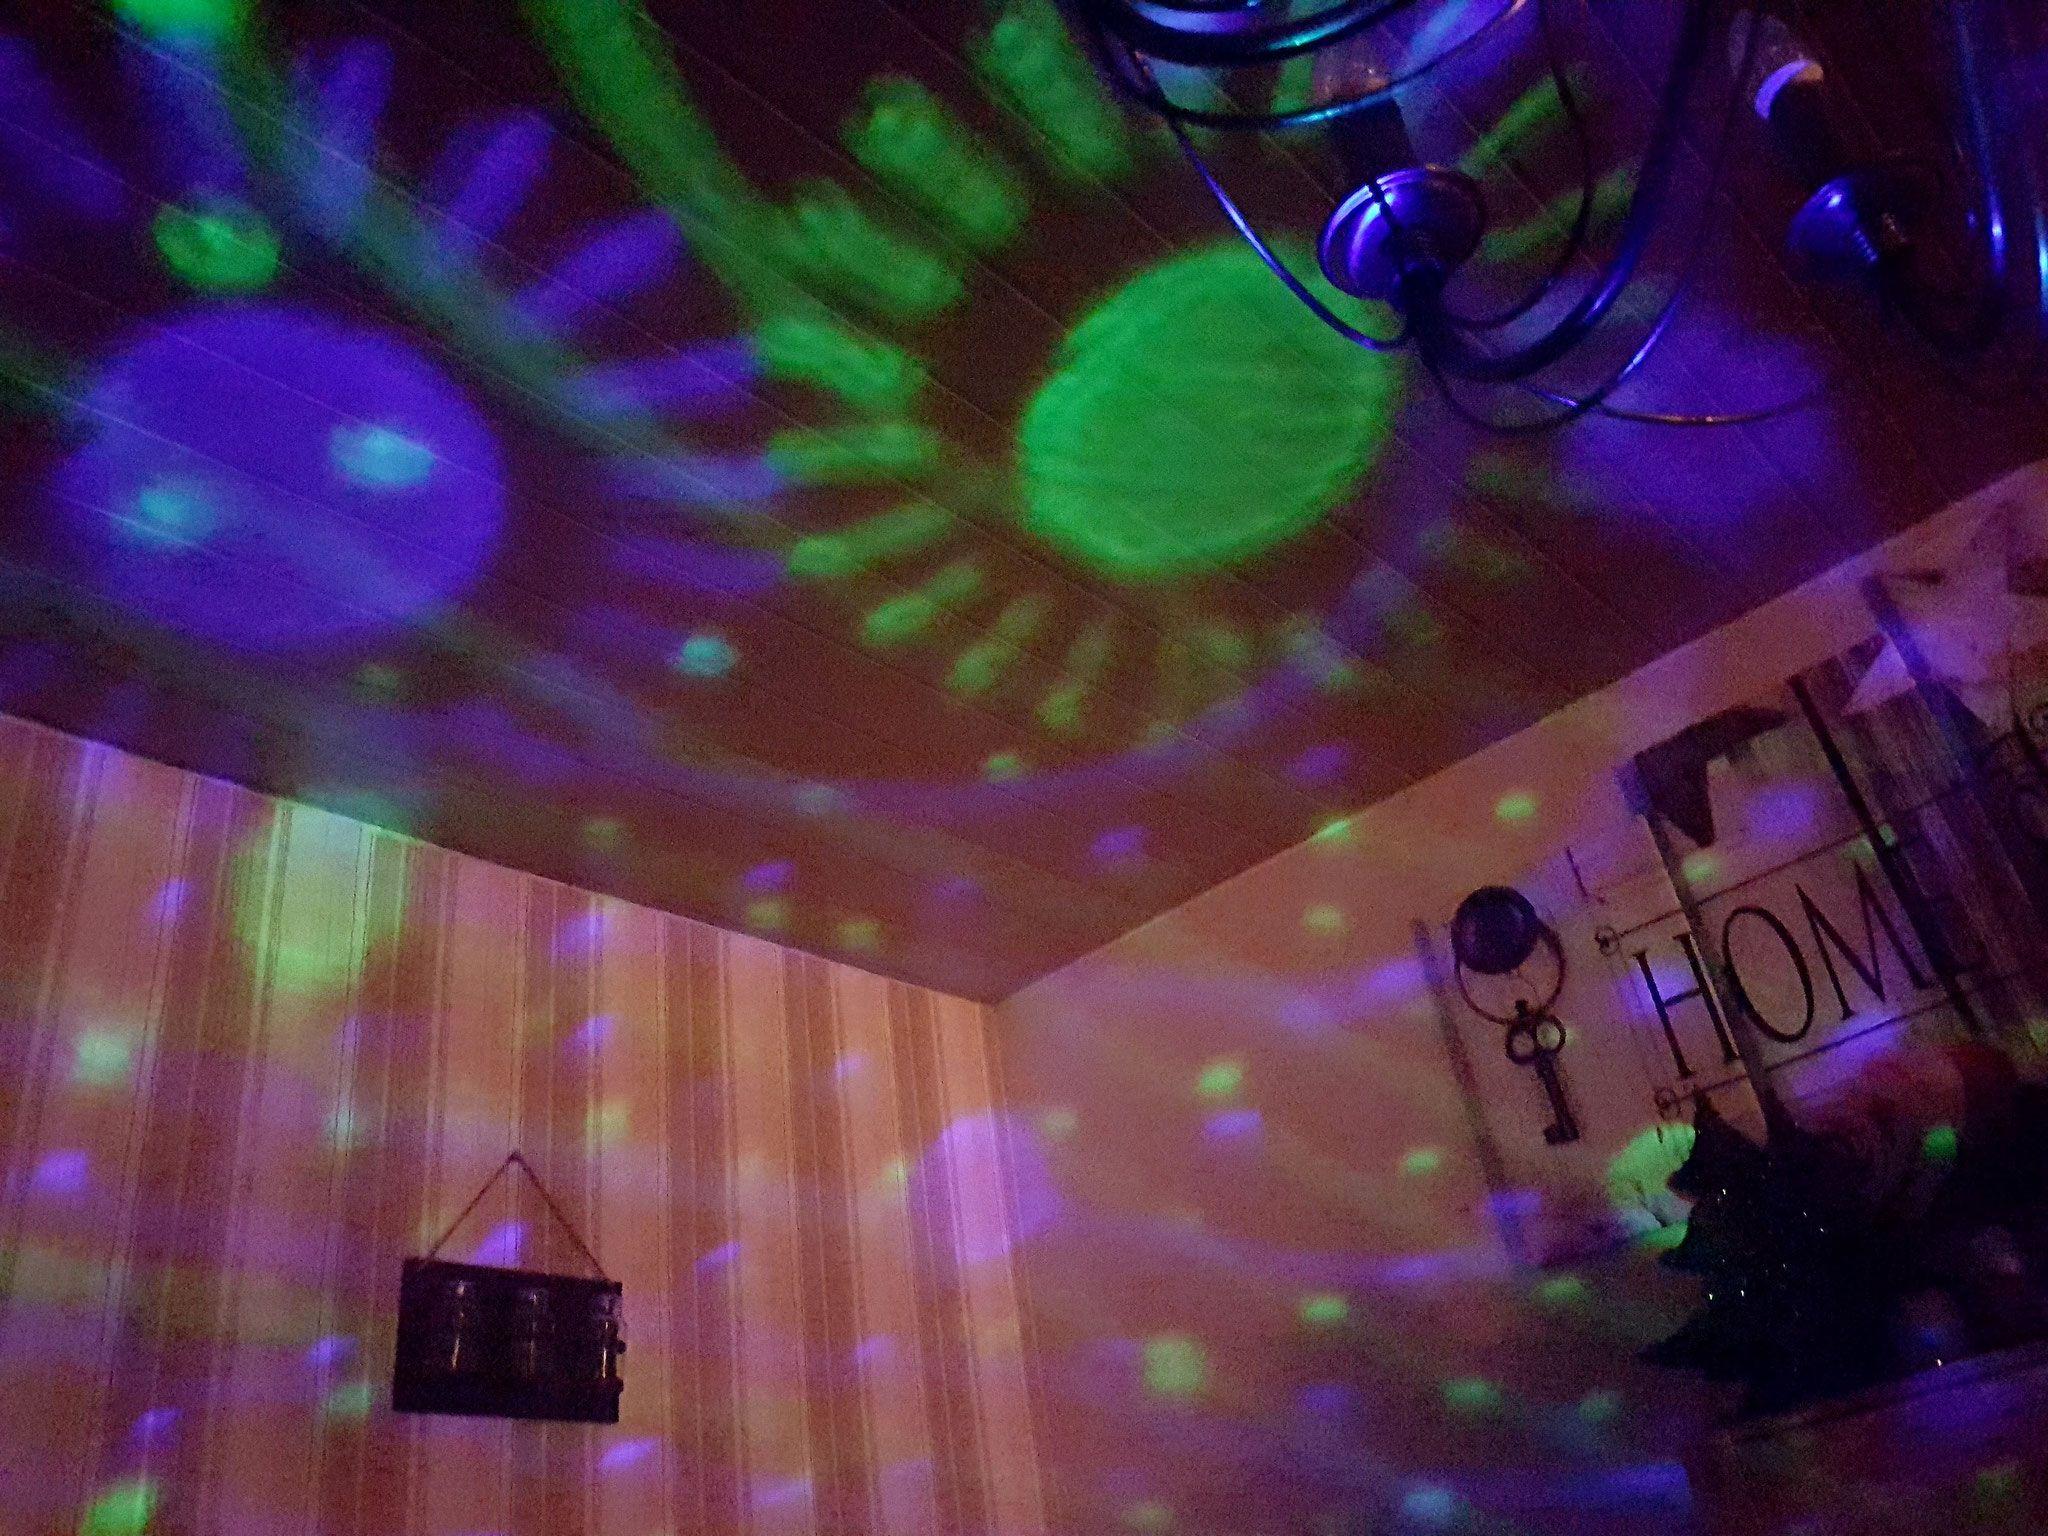 Sternenhimmel Projektor Testtulpes Webseite Neon Signs Neon